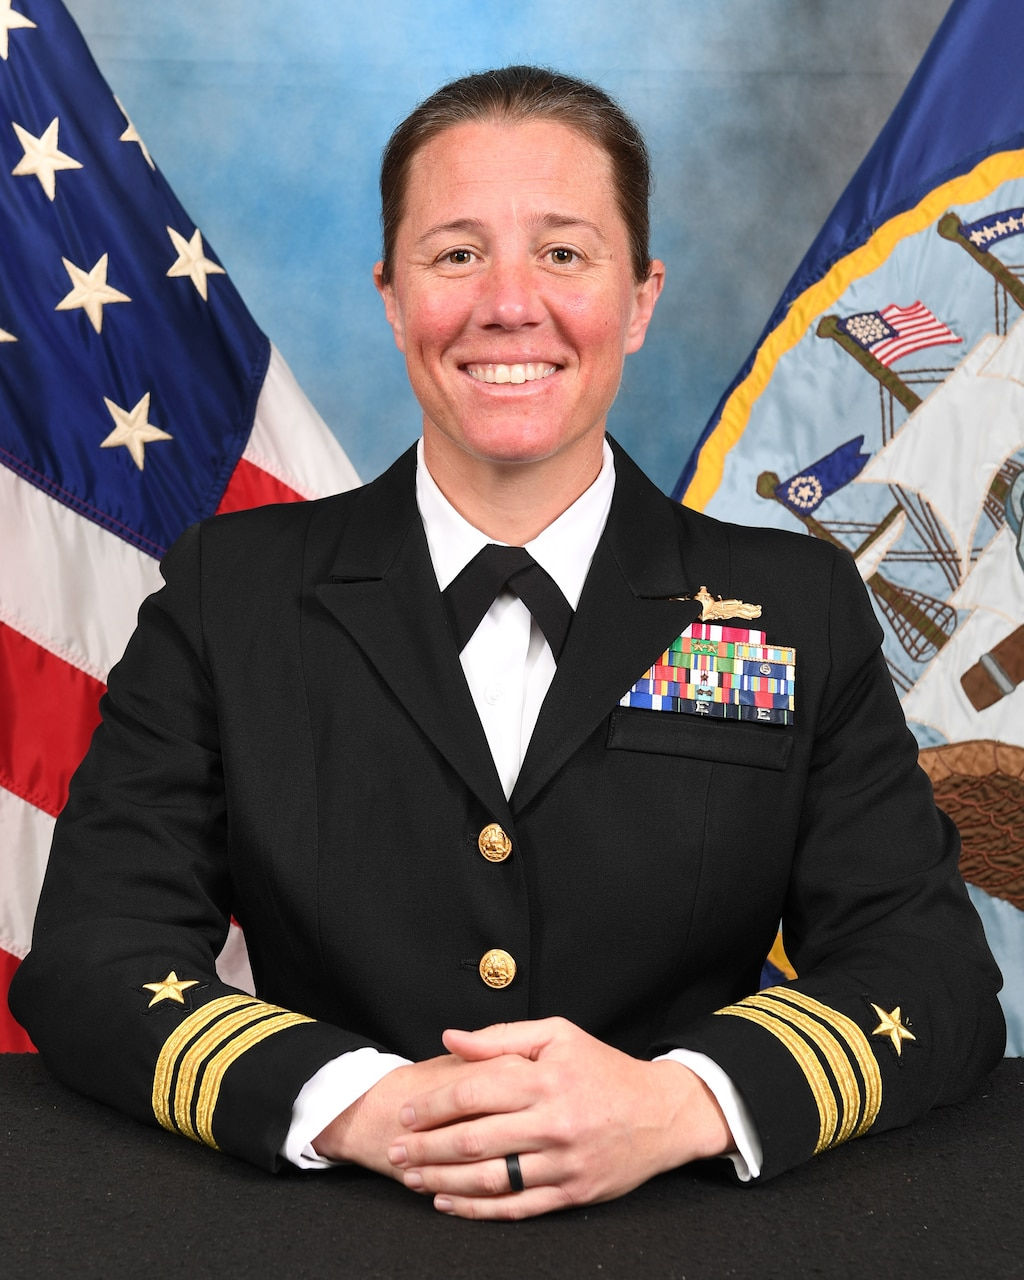 CDR Kathleen R. Whitman